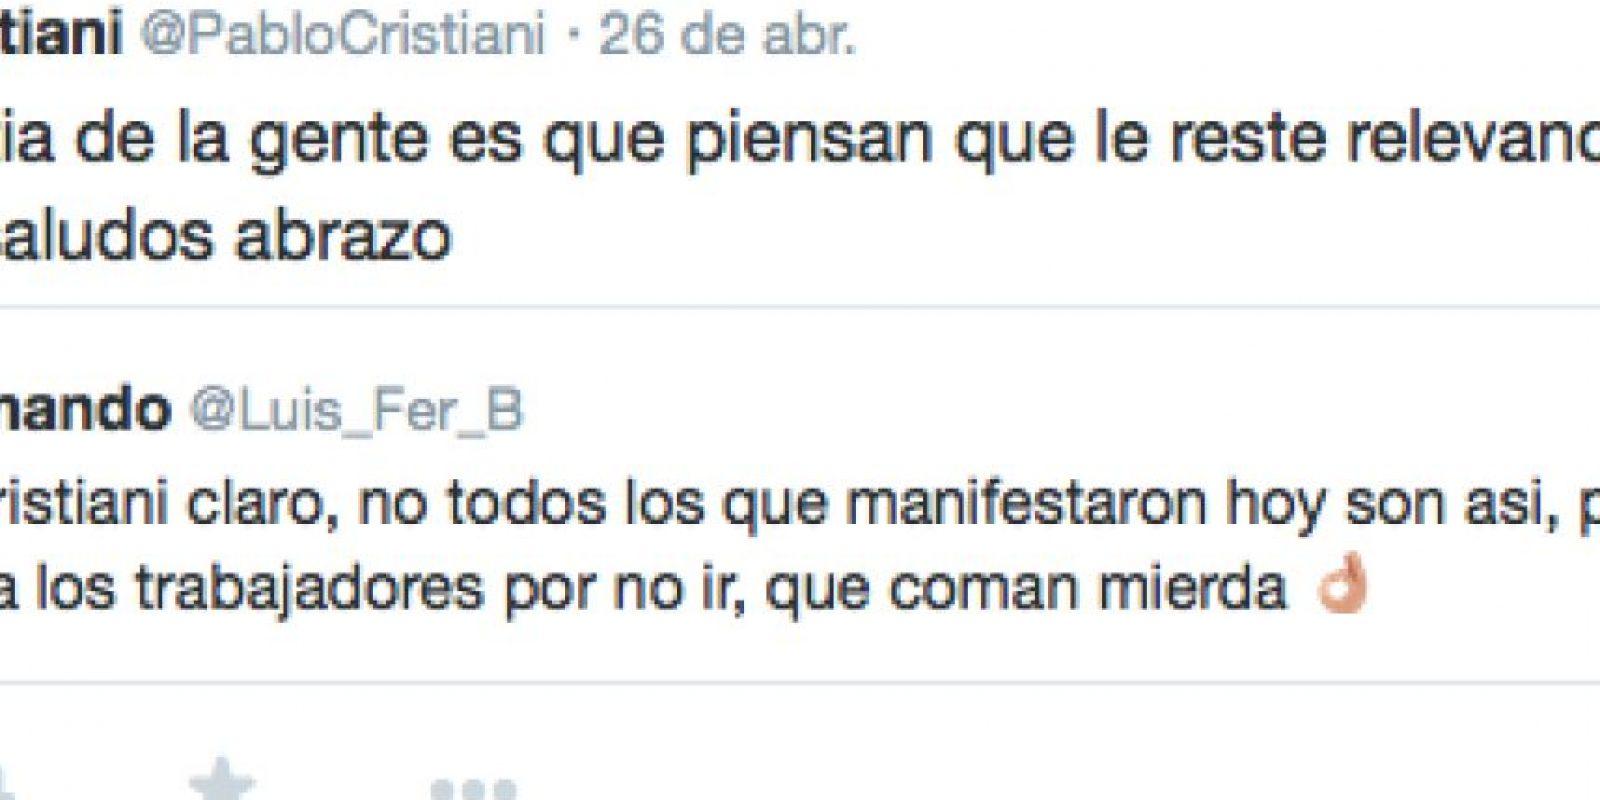 Foto:Twitter Pablo Cristiani